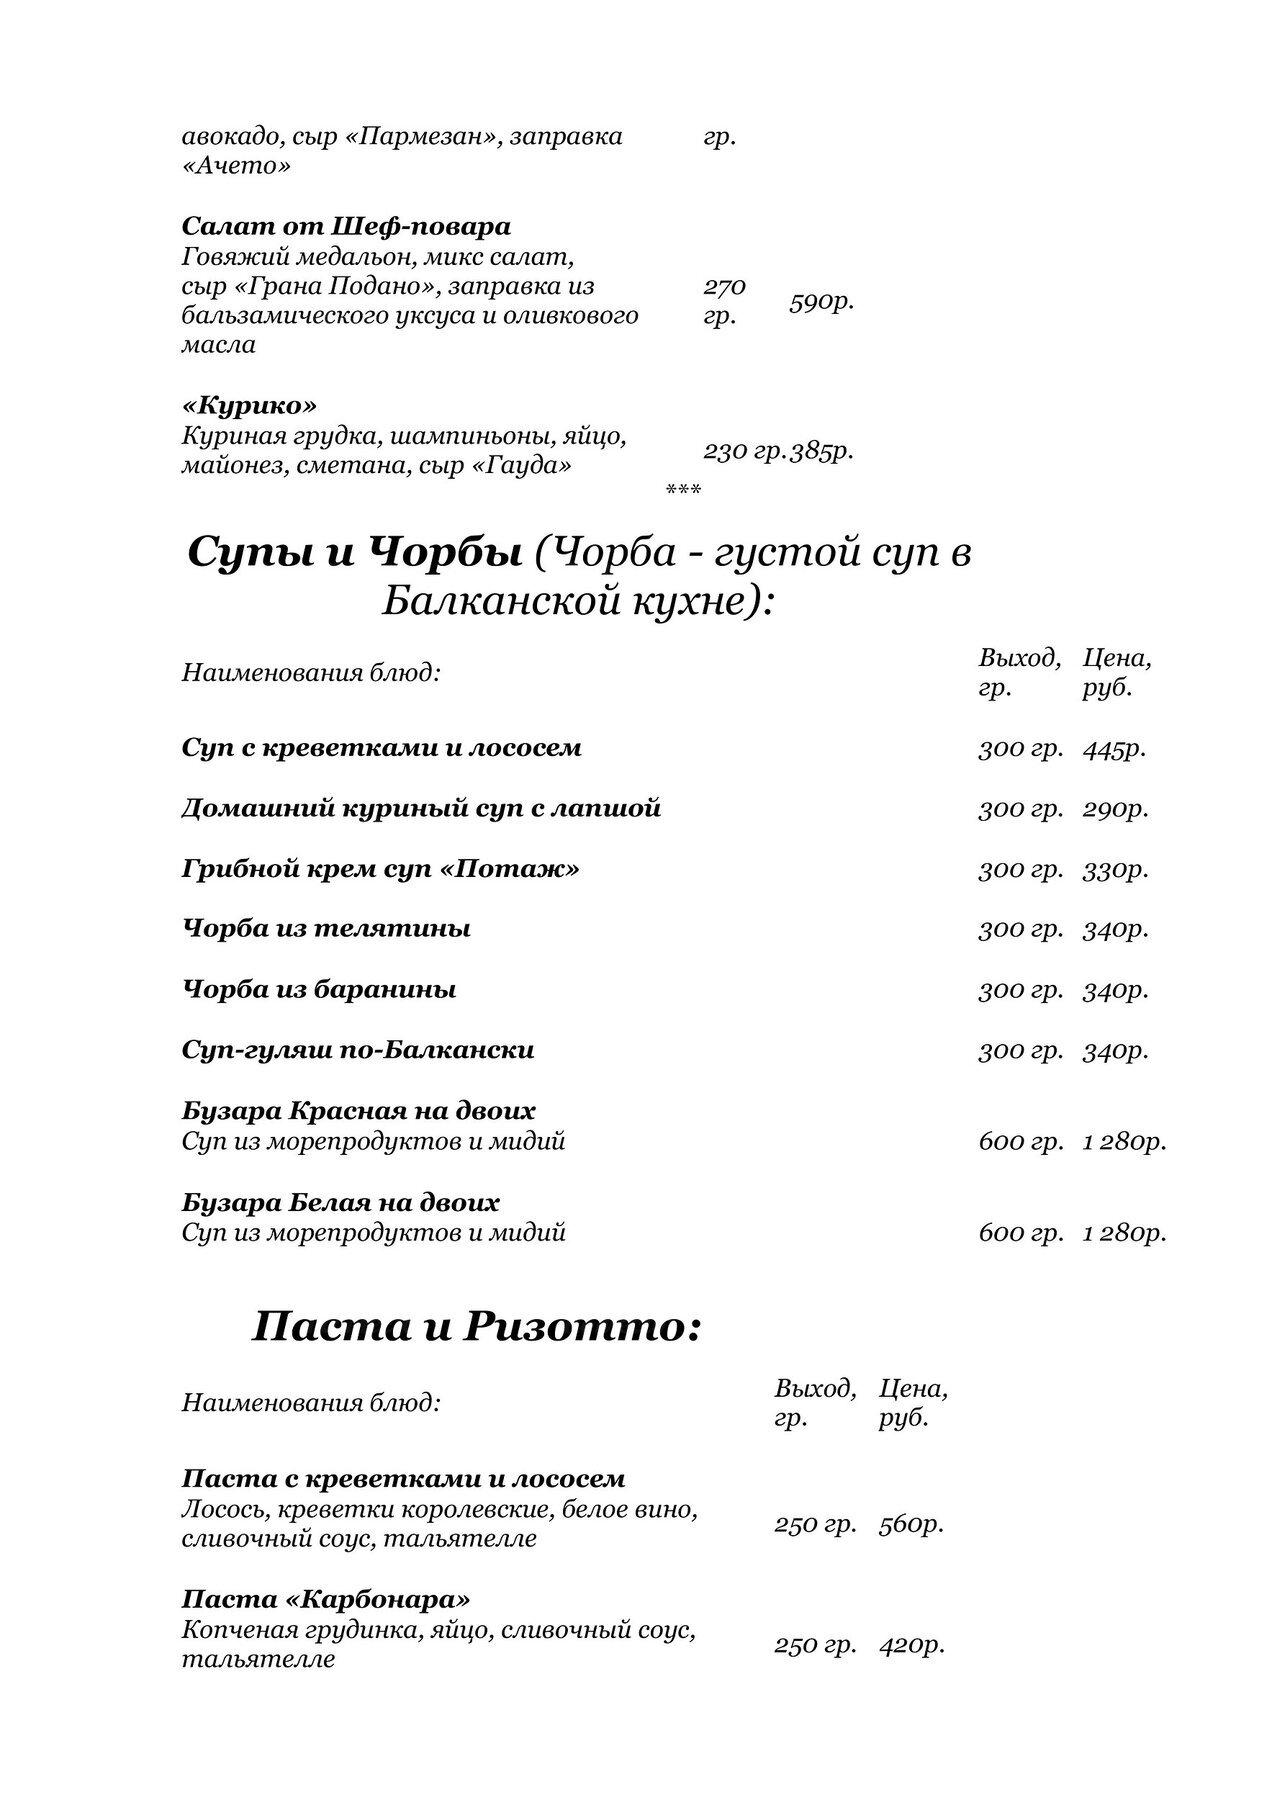 Меню ресторана Балканский Гурман на Декабристов фото 4